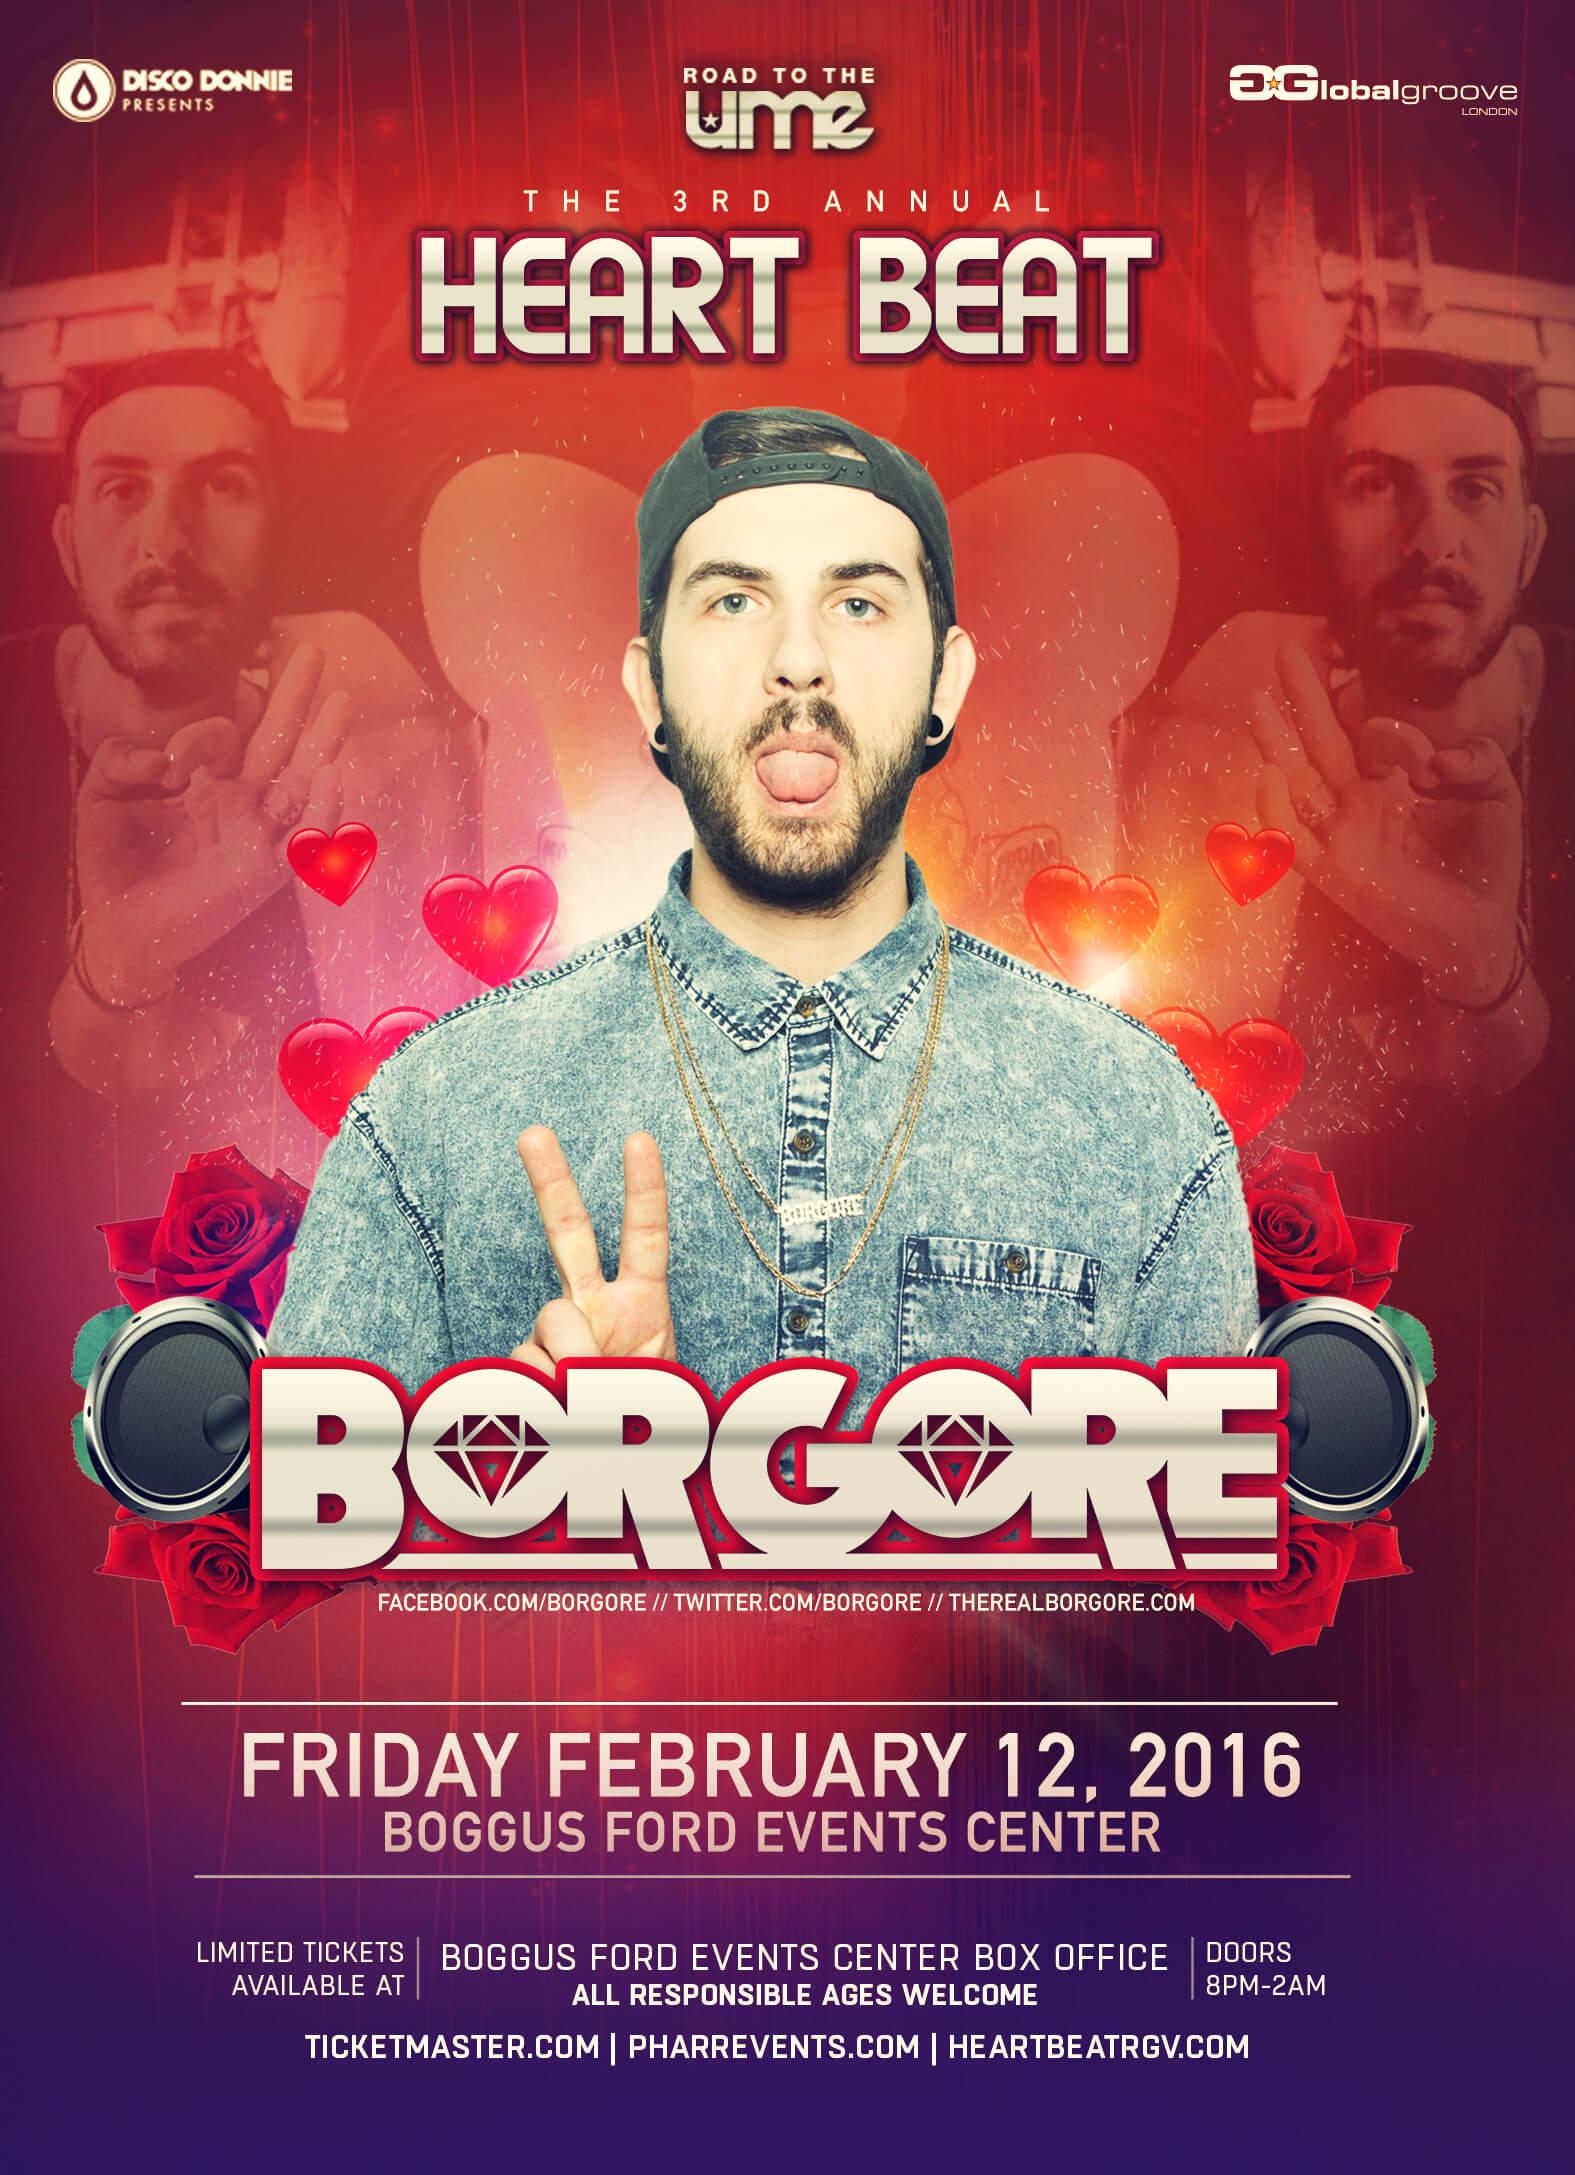 Heart Beat 2016